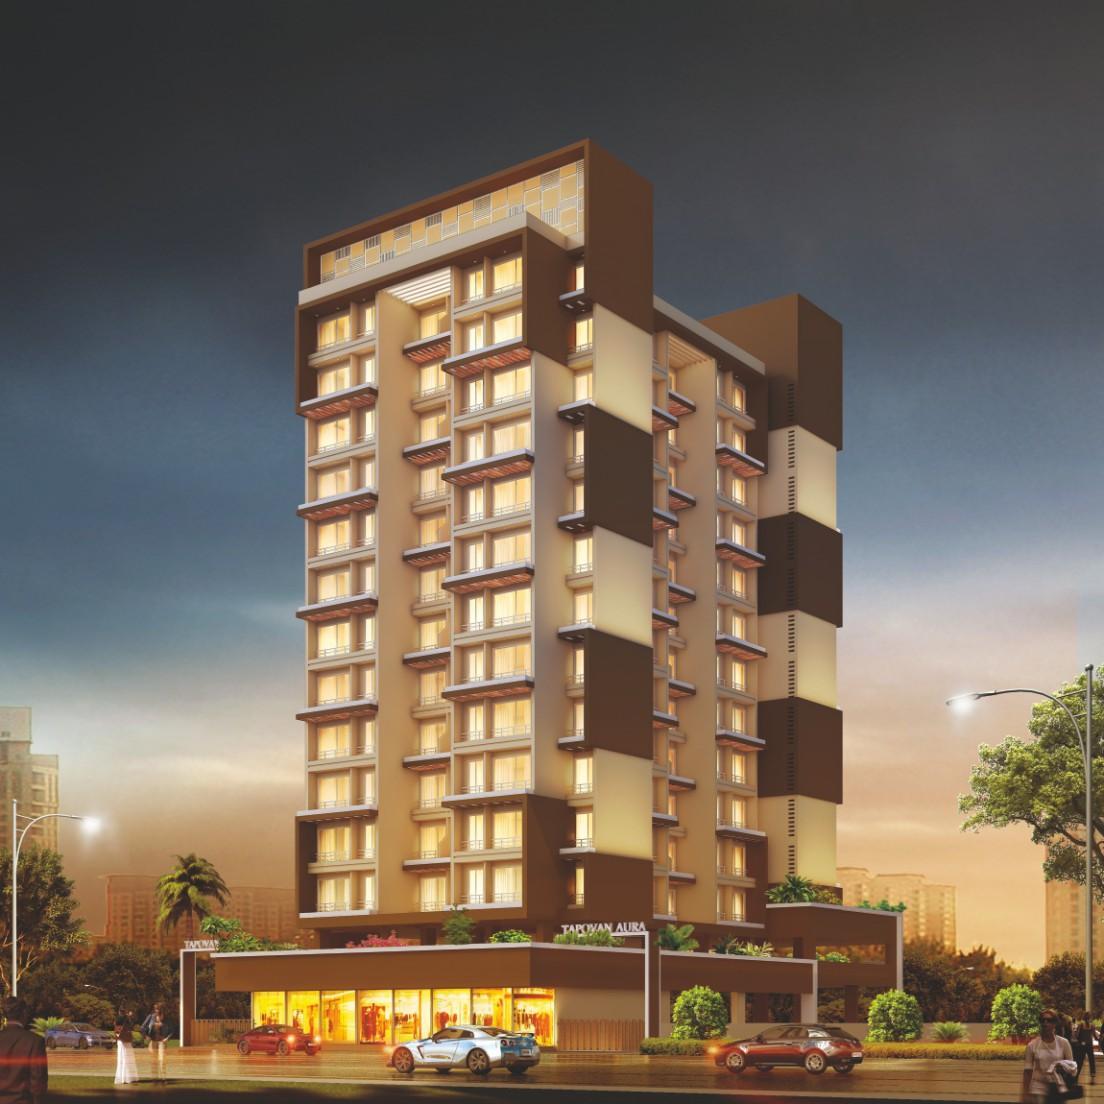 1 & 2BHK Flats in Ulwe Navi Mumbai in Tapovan Aura - Sqmtrs